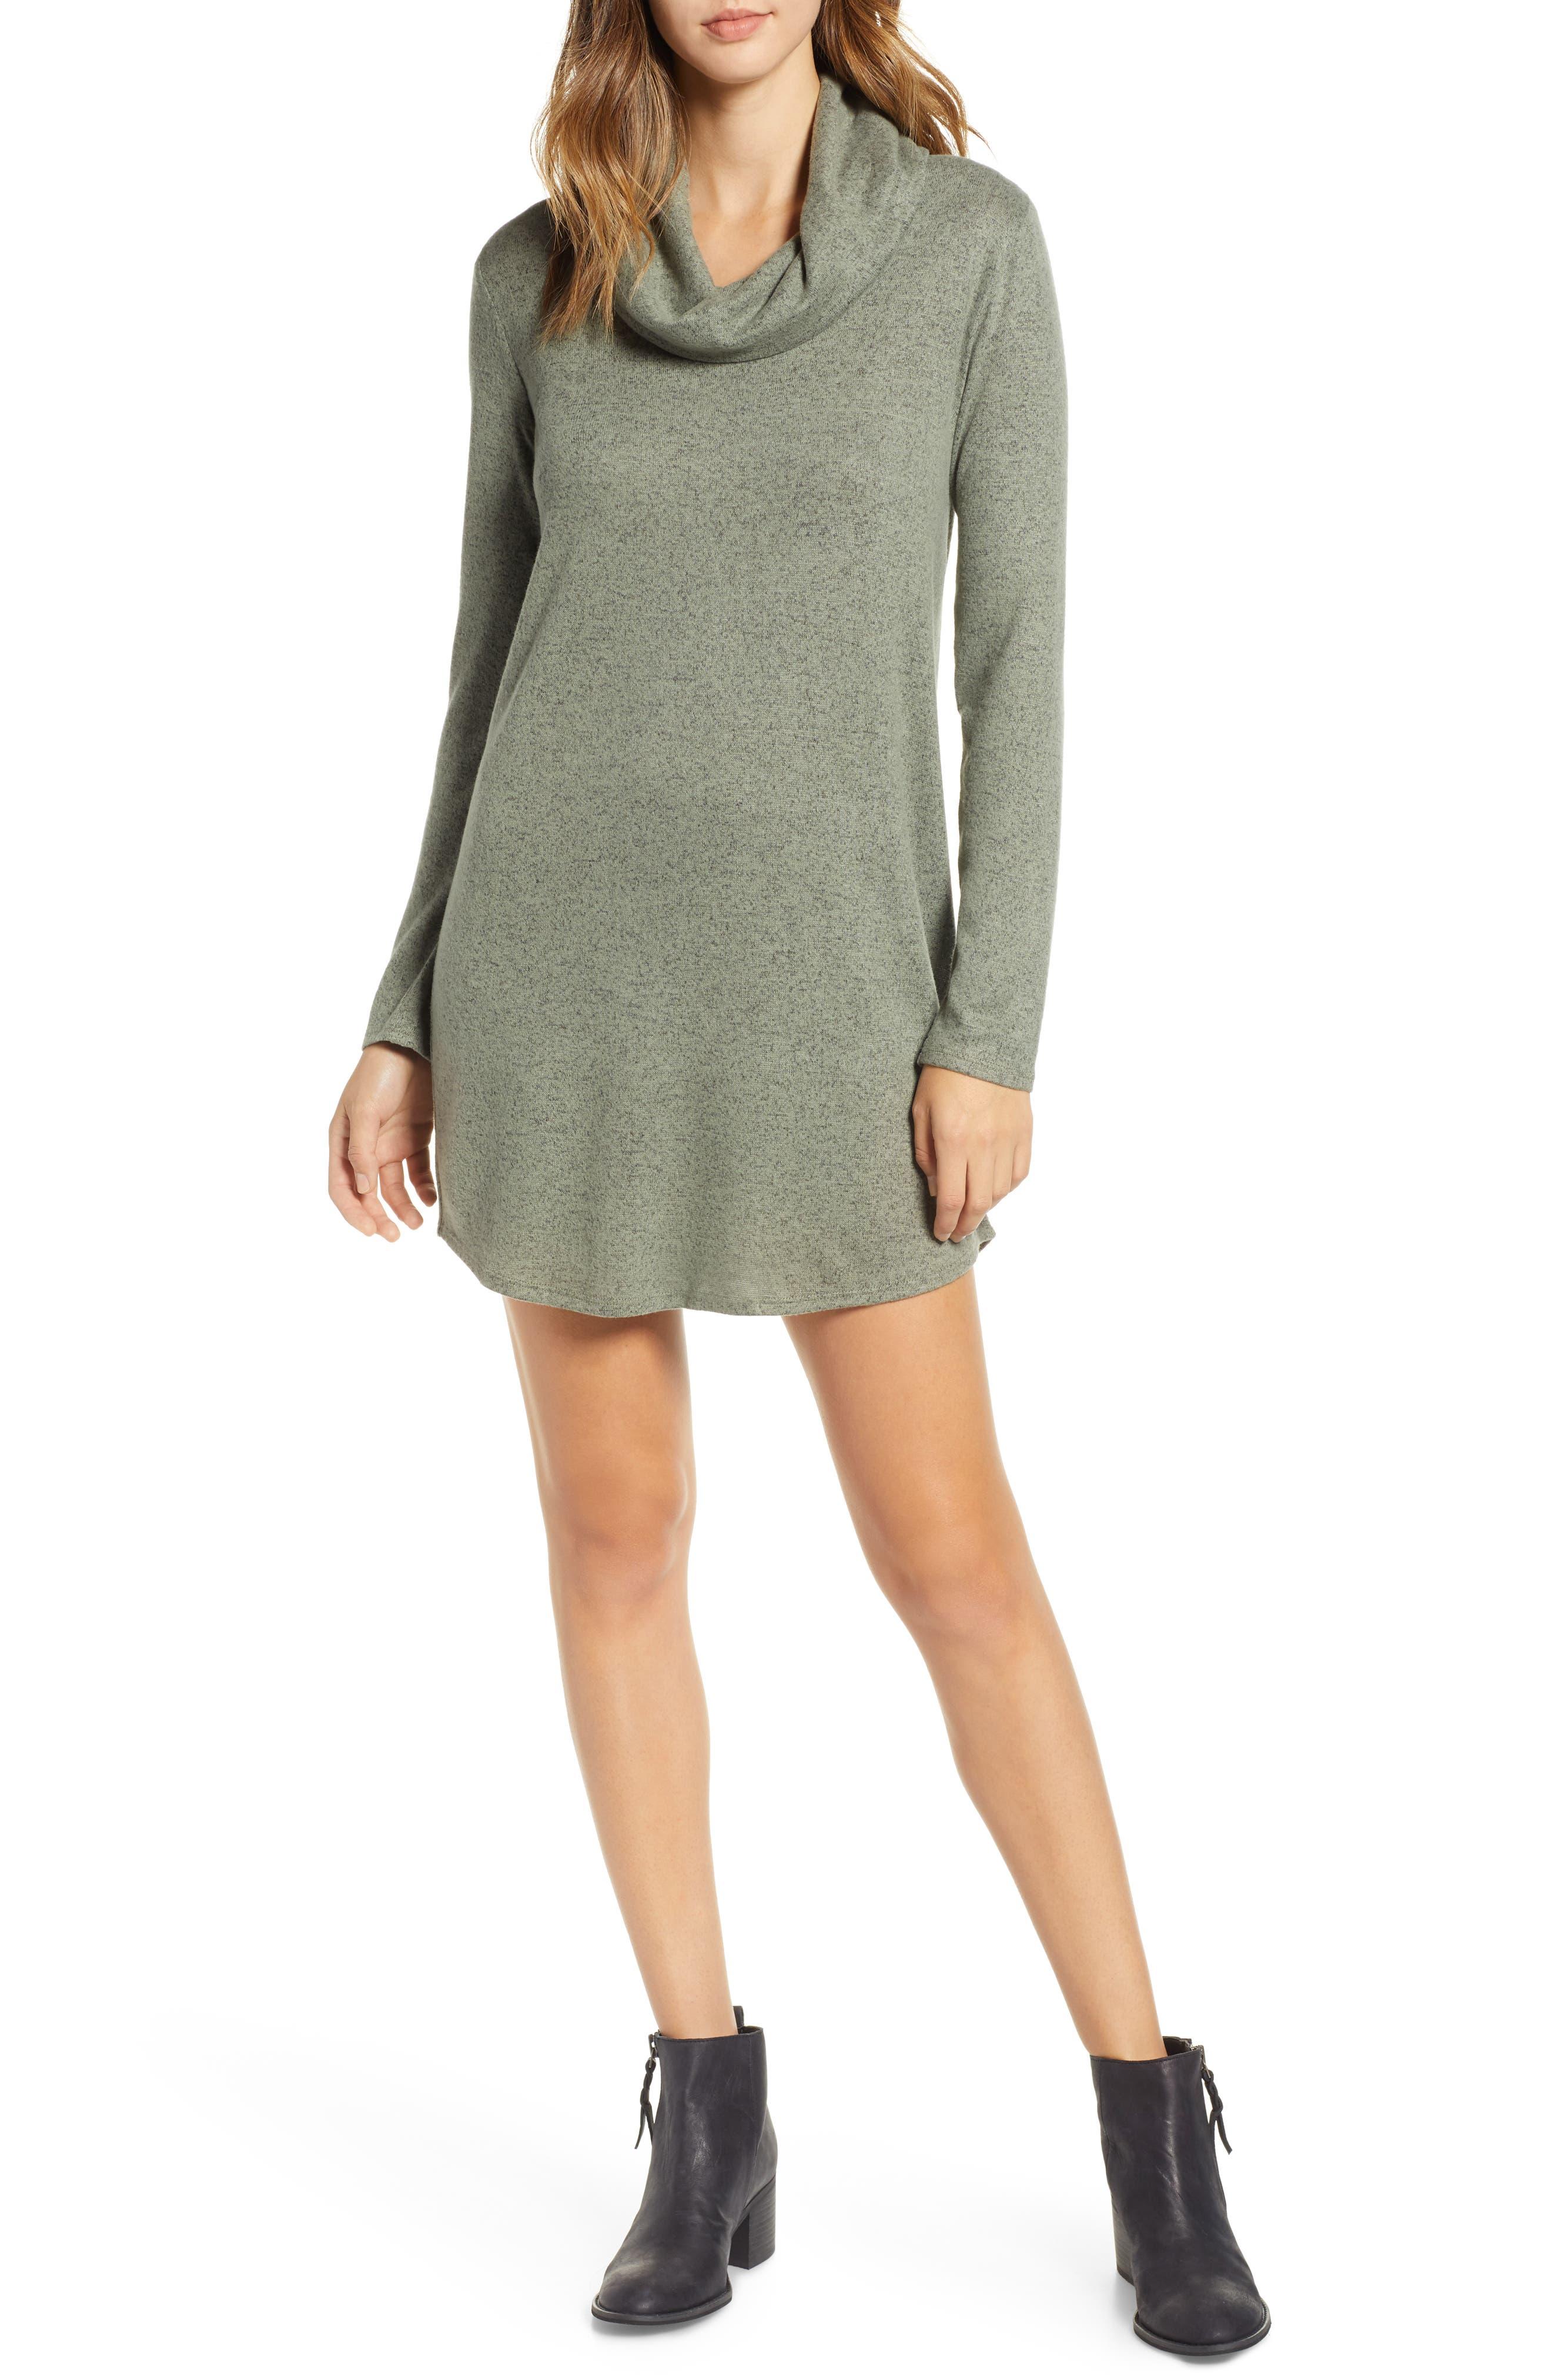 Socialite Cowl Neck Knit Dress, Green